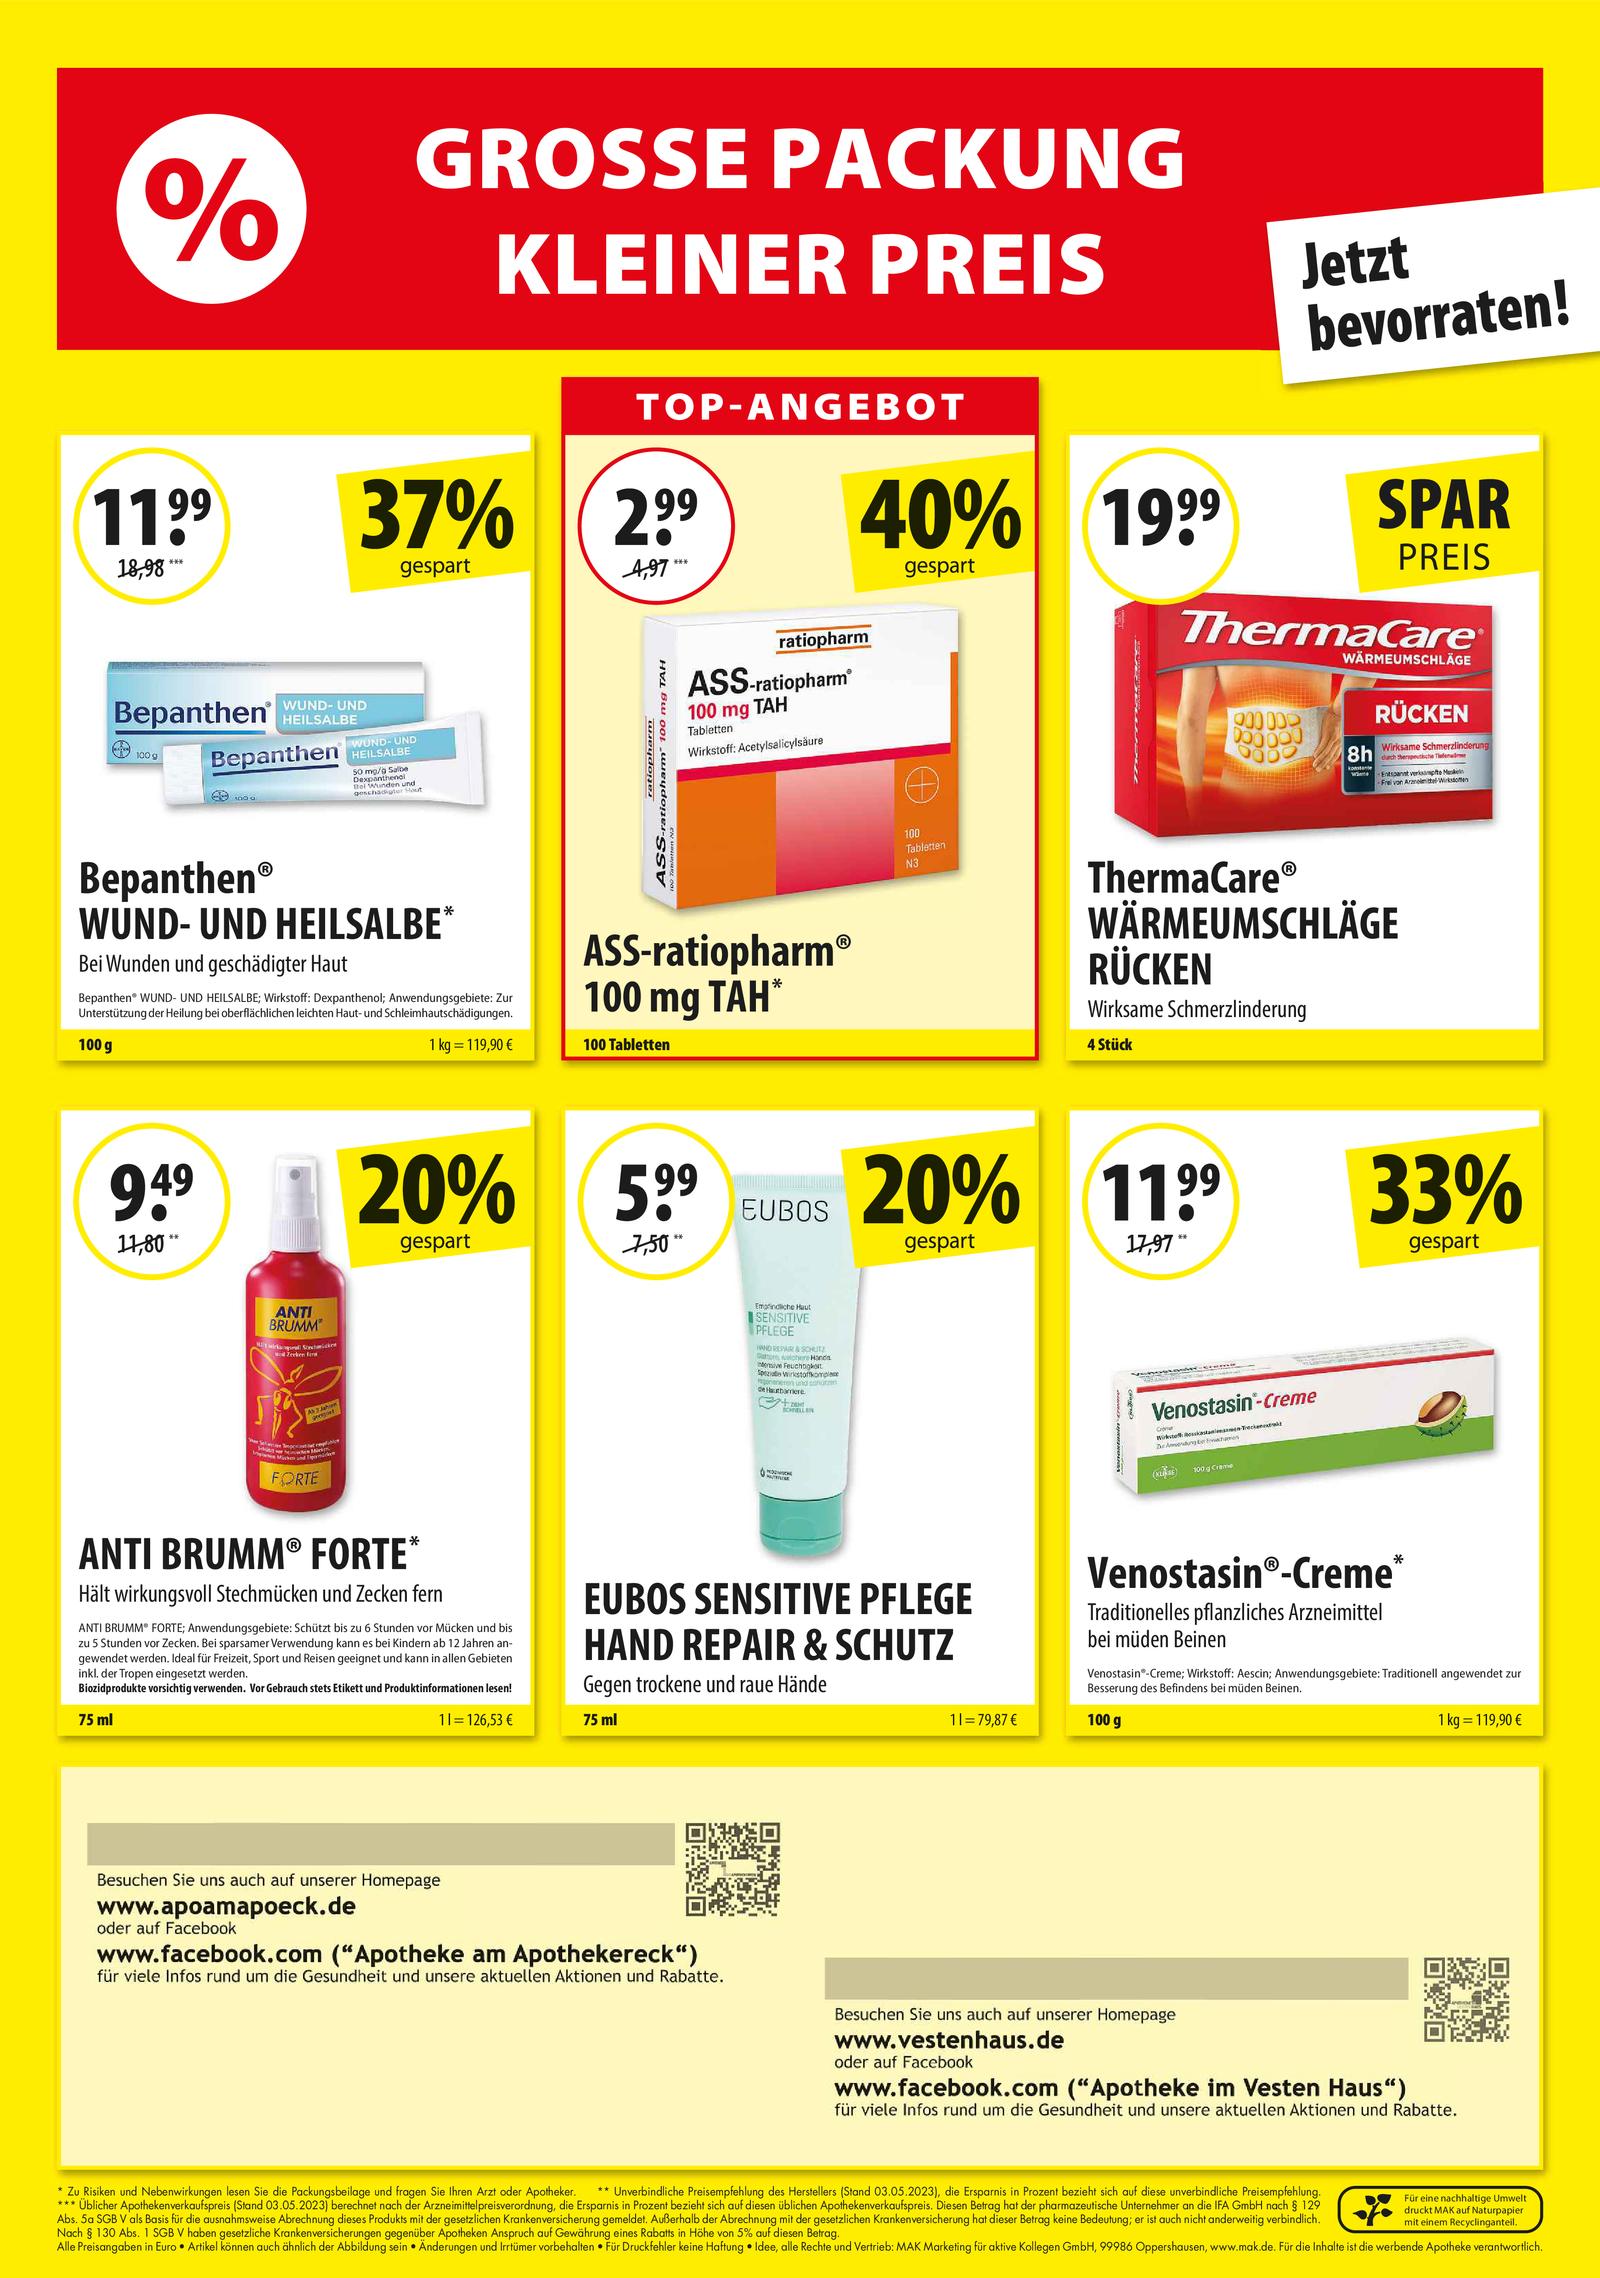 https://mein-uploads.apocdn.net/2181/leaflets/2181_flyer-Seite4.png